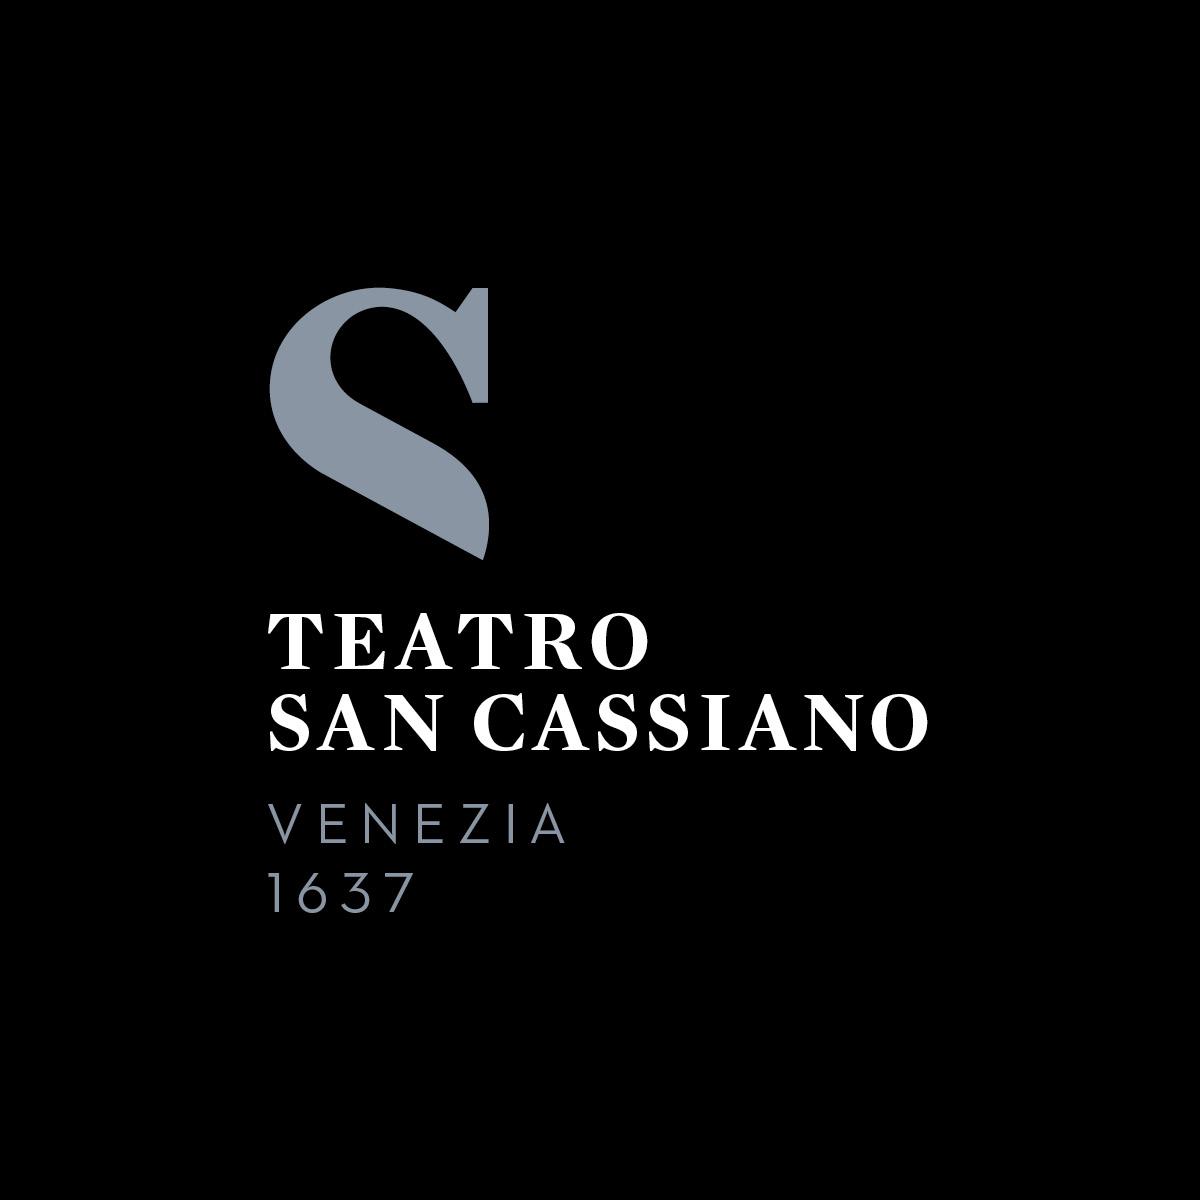 Teatro-San-CassianoIdentity-001